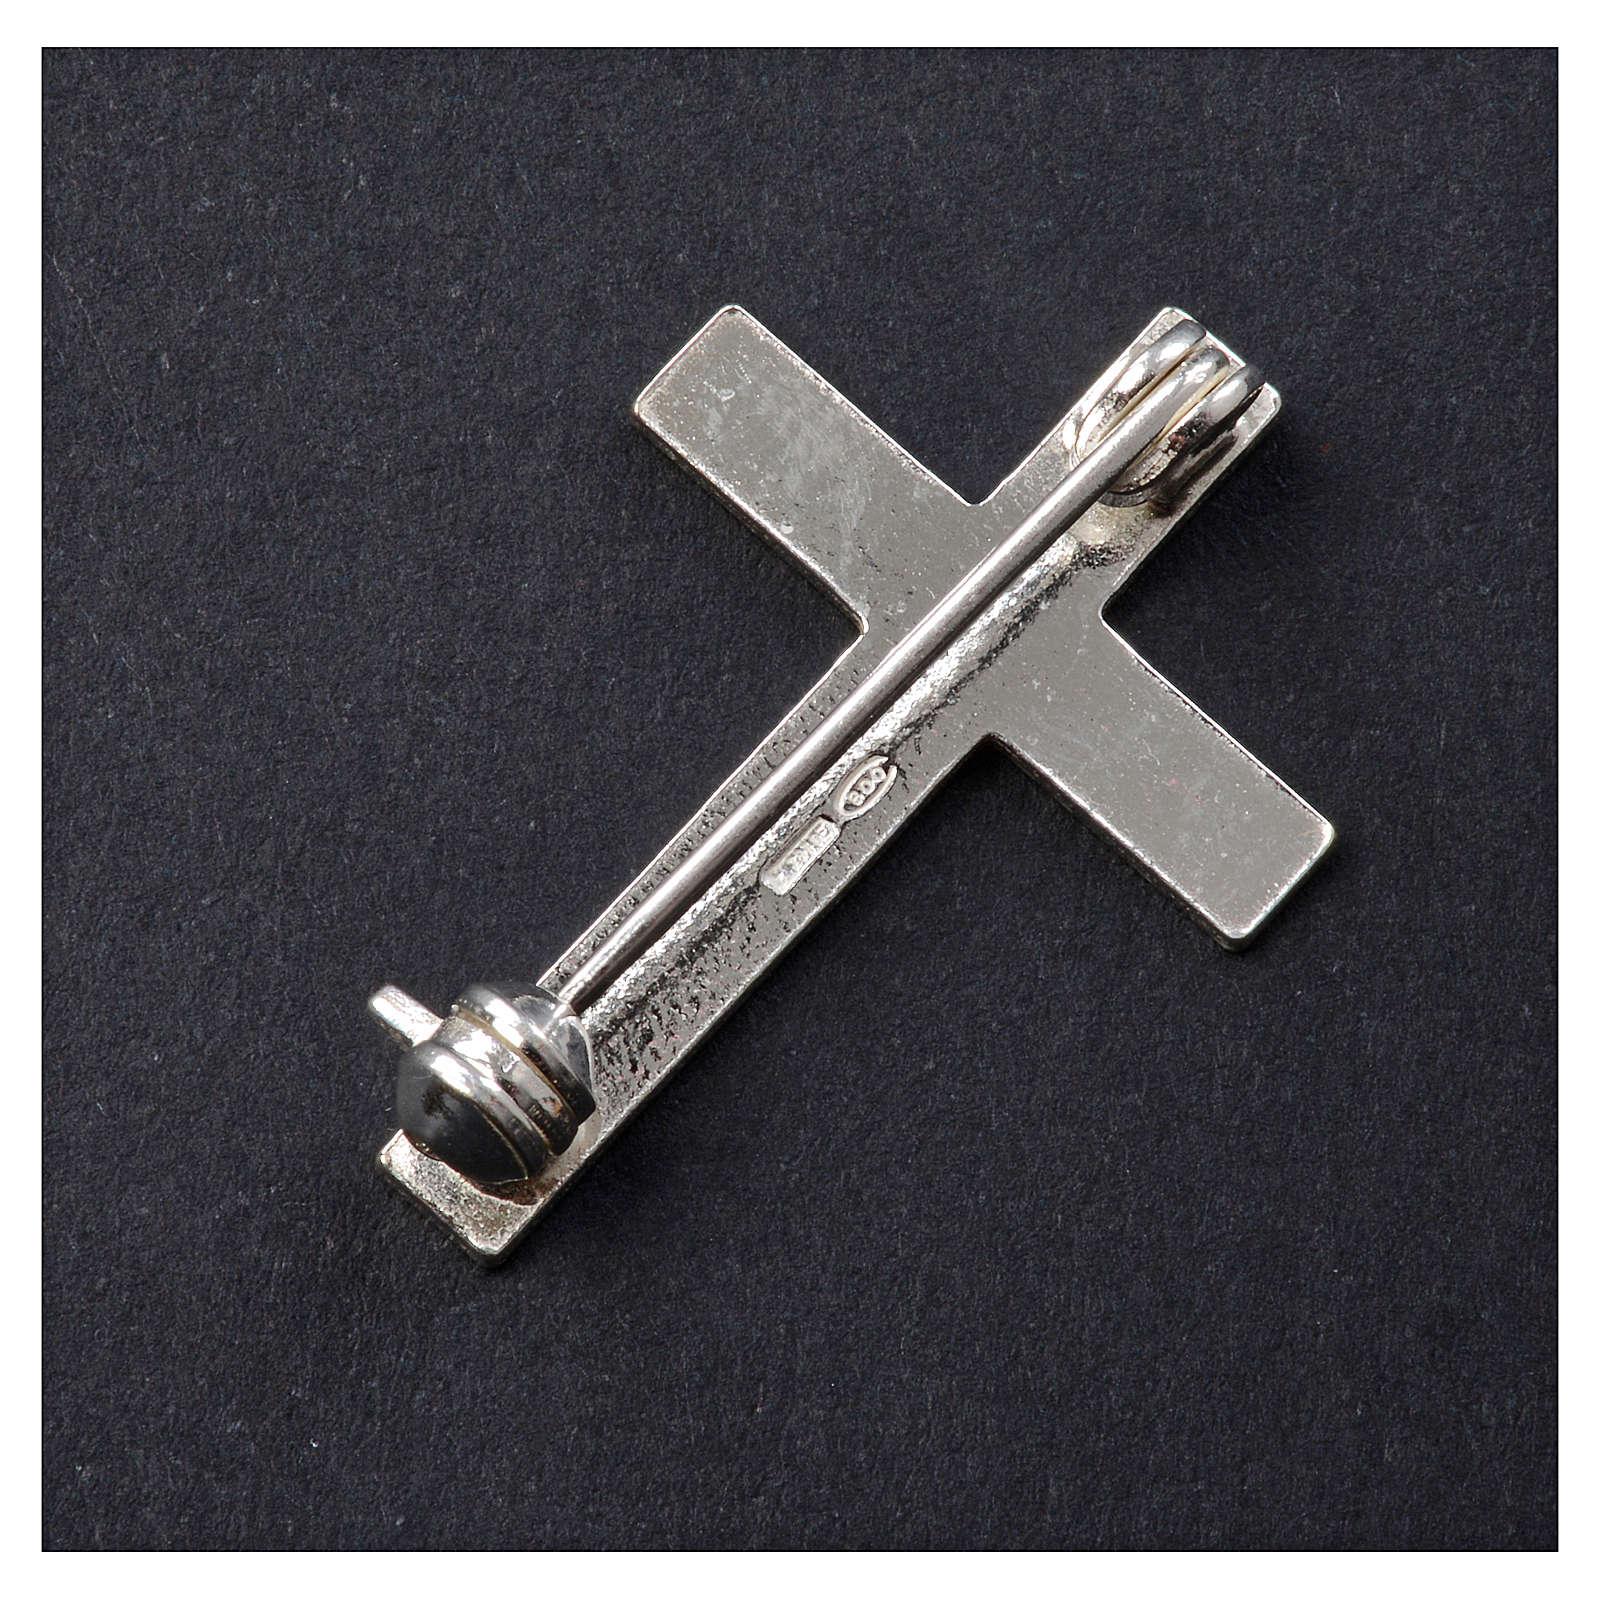 Clergyman cross pin in 925 silver 4